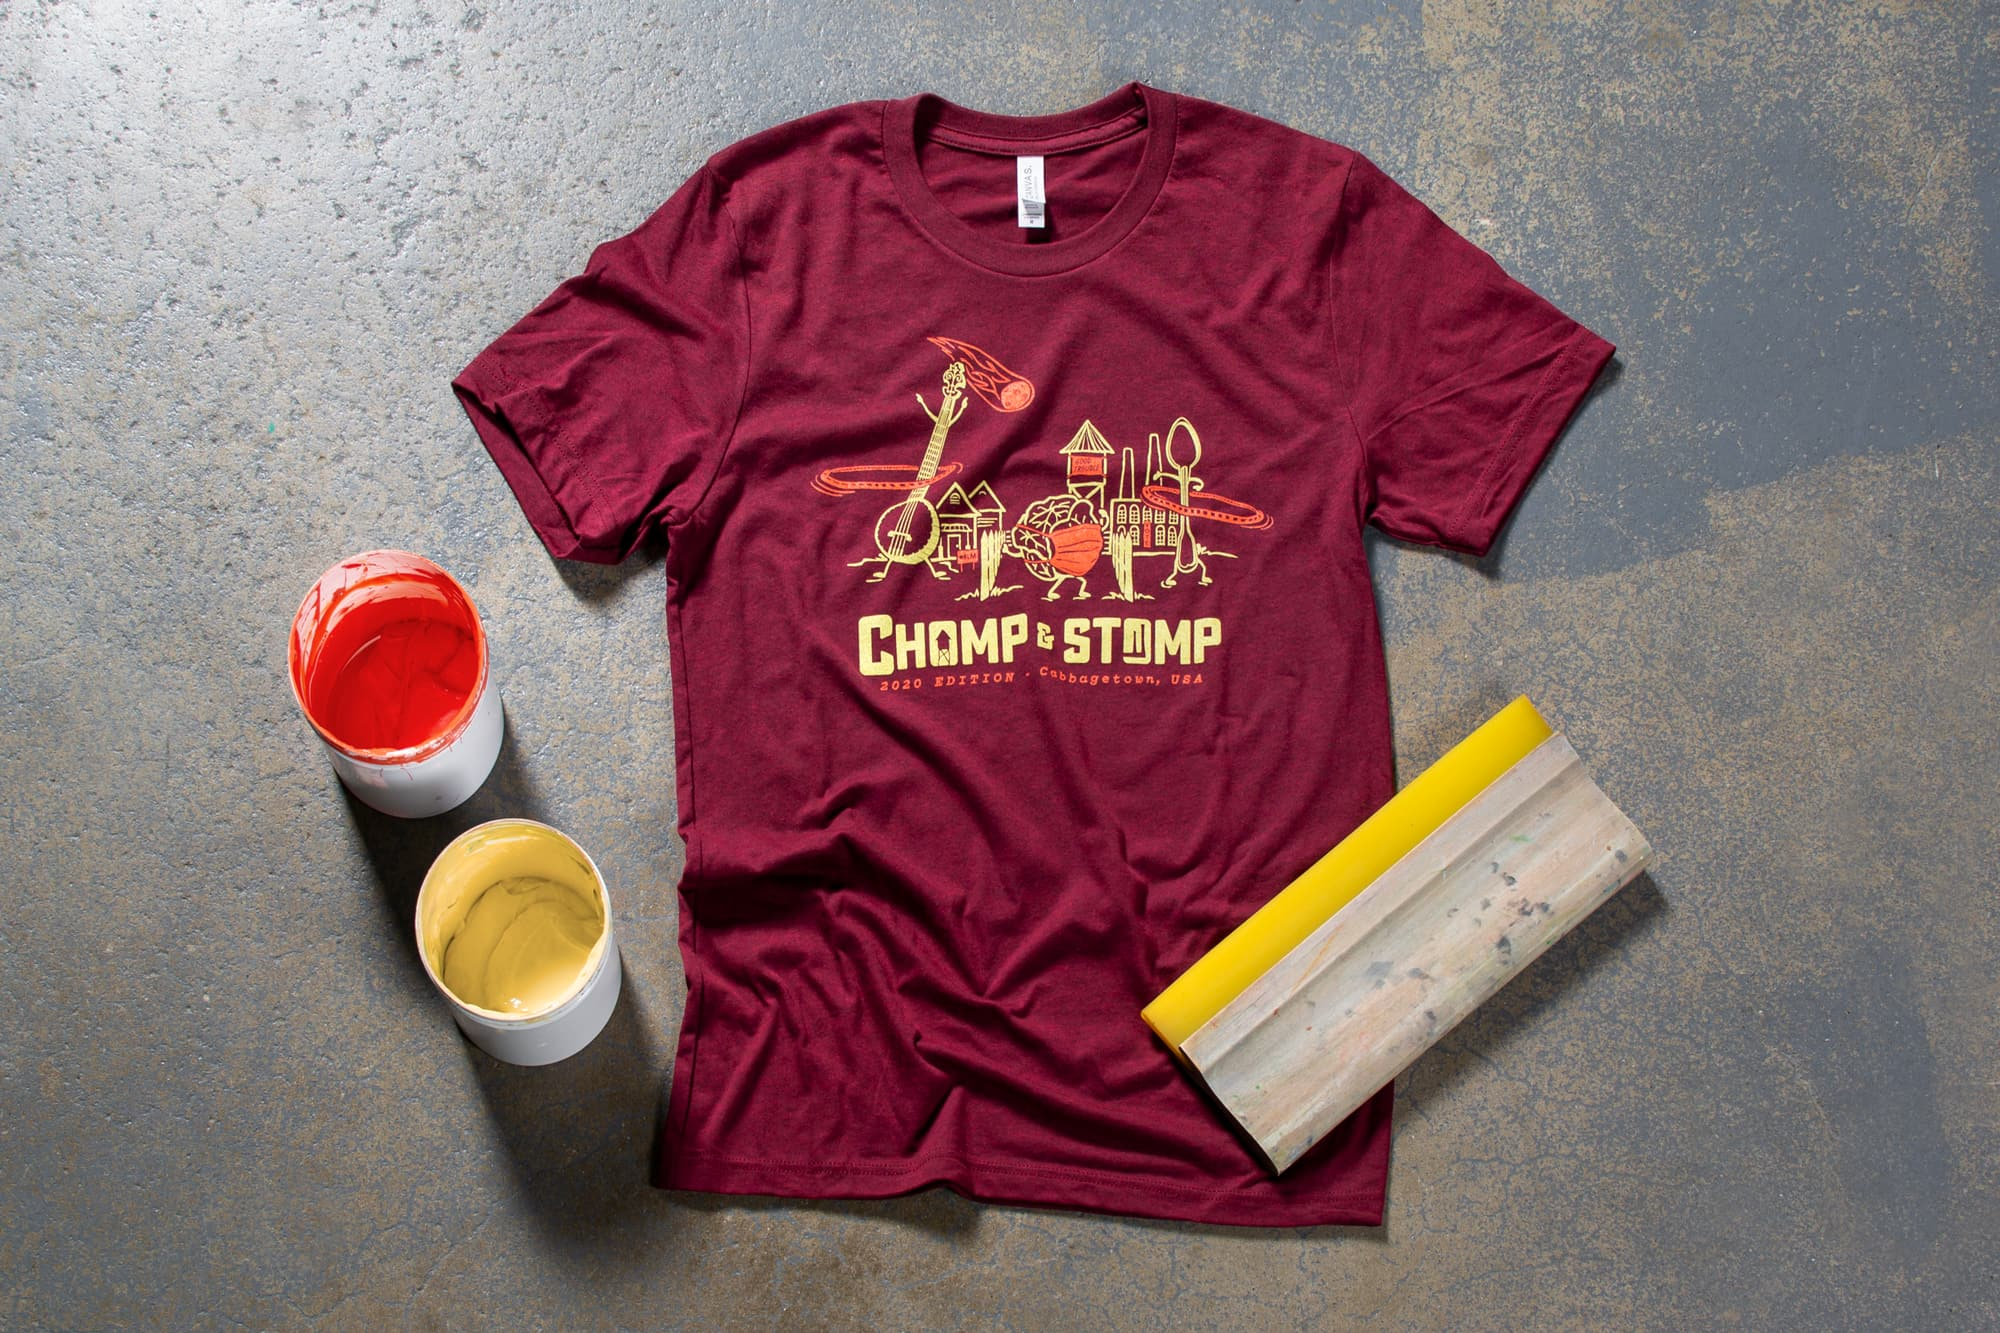 Flatlay image of Chomp and Stomp t-shirt.